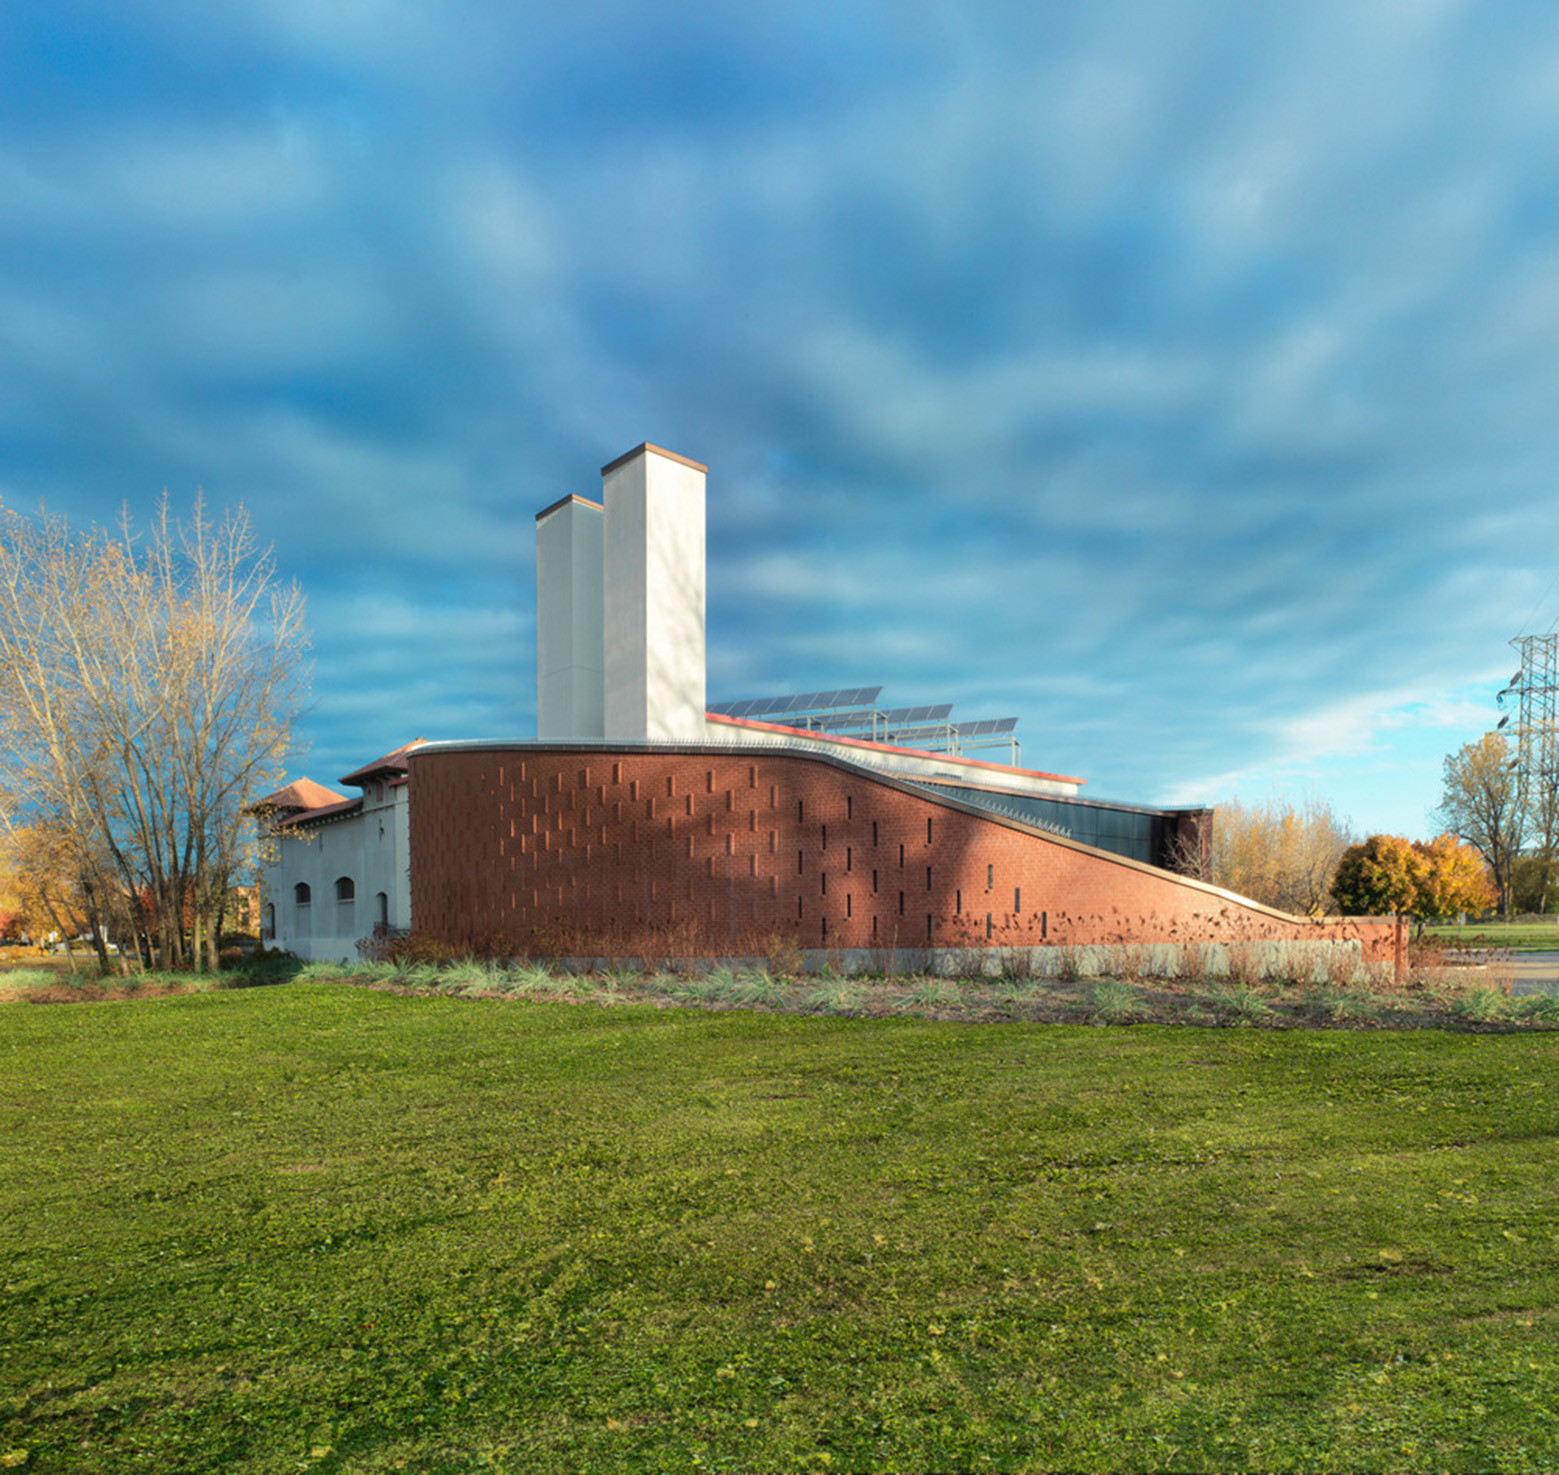 LaSalle Waterworks Building / Affleck de la Riva architects, © Marc Cramer